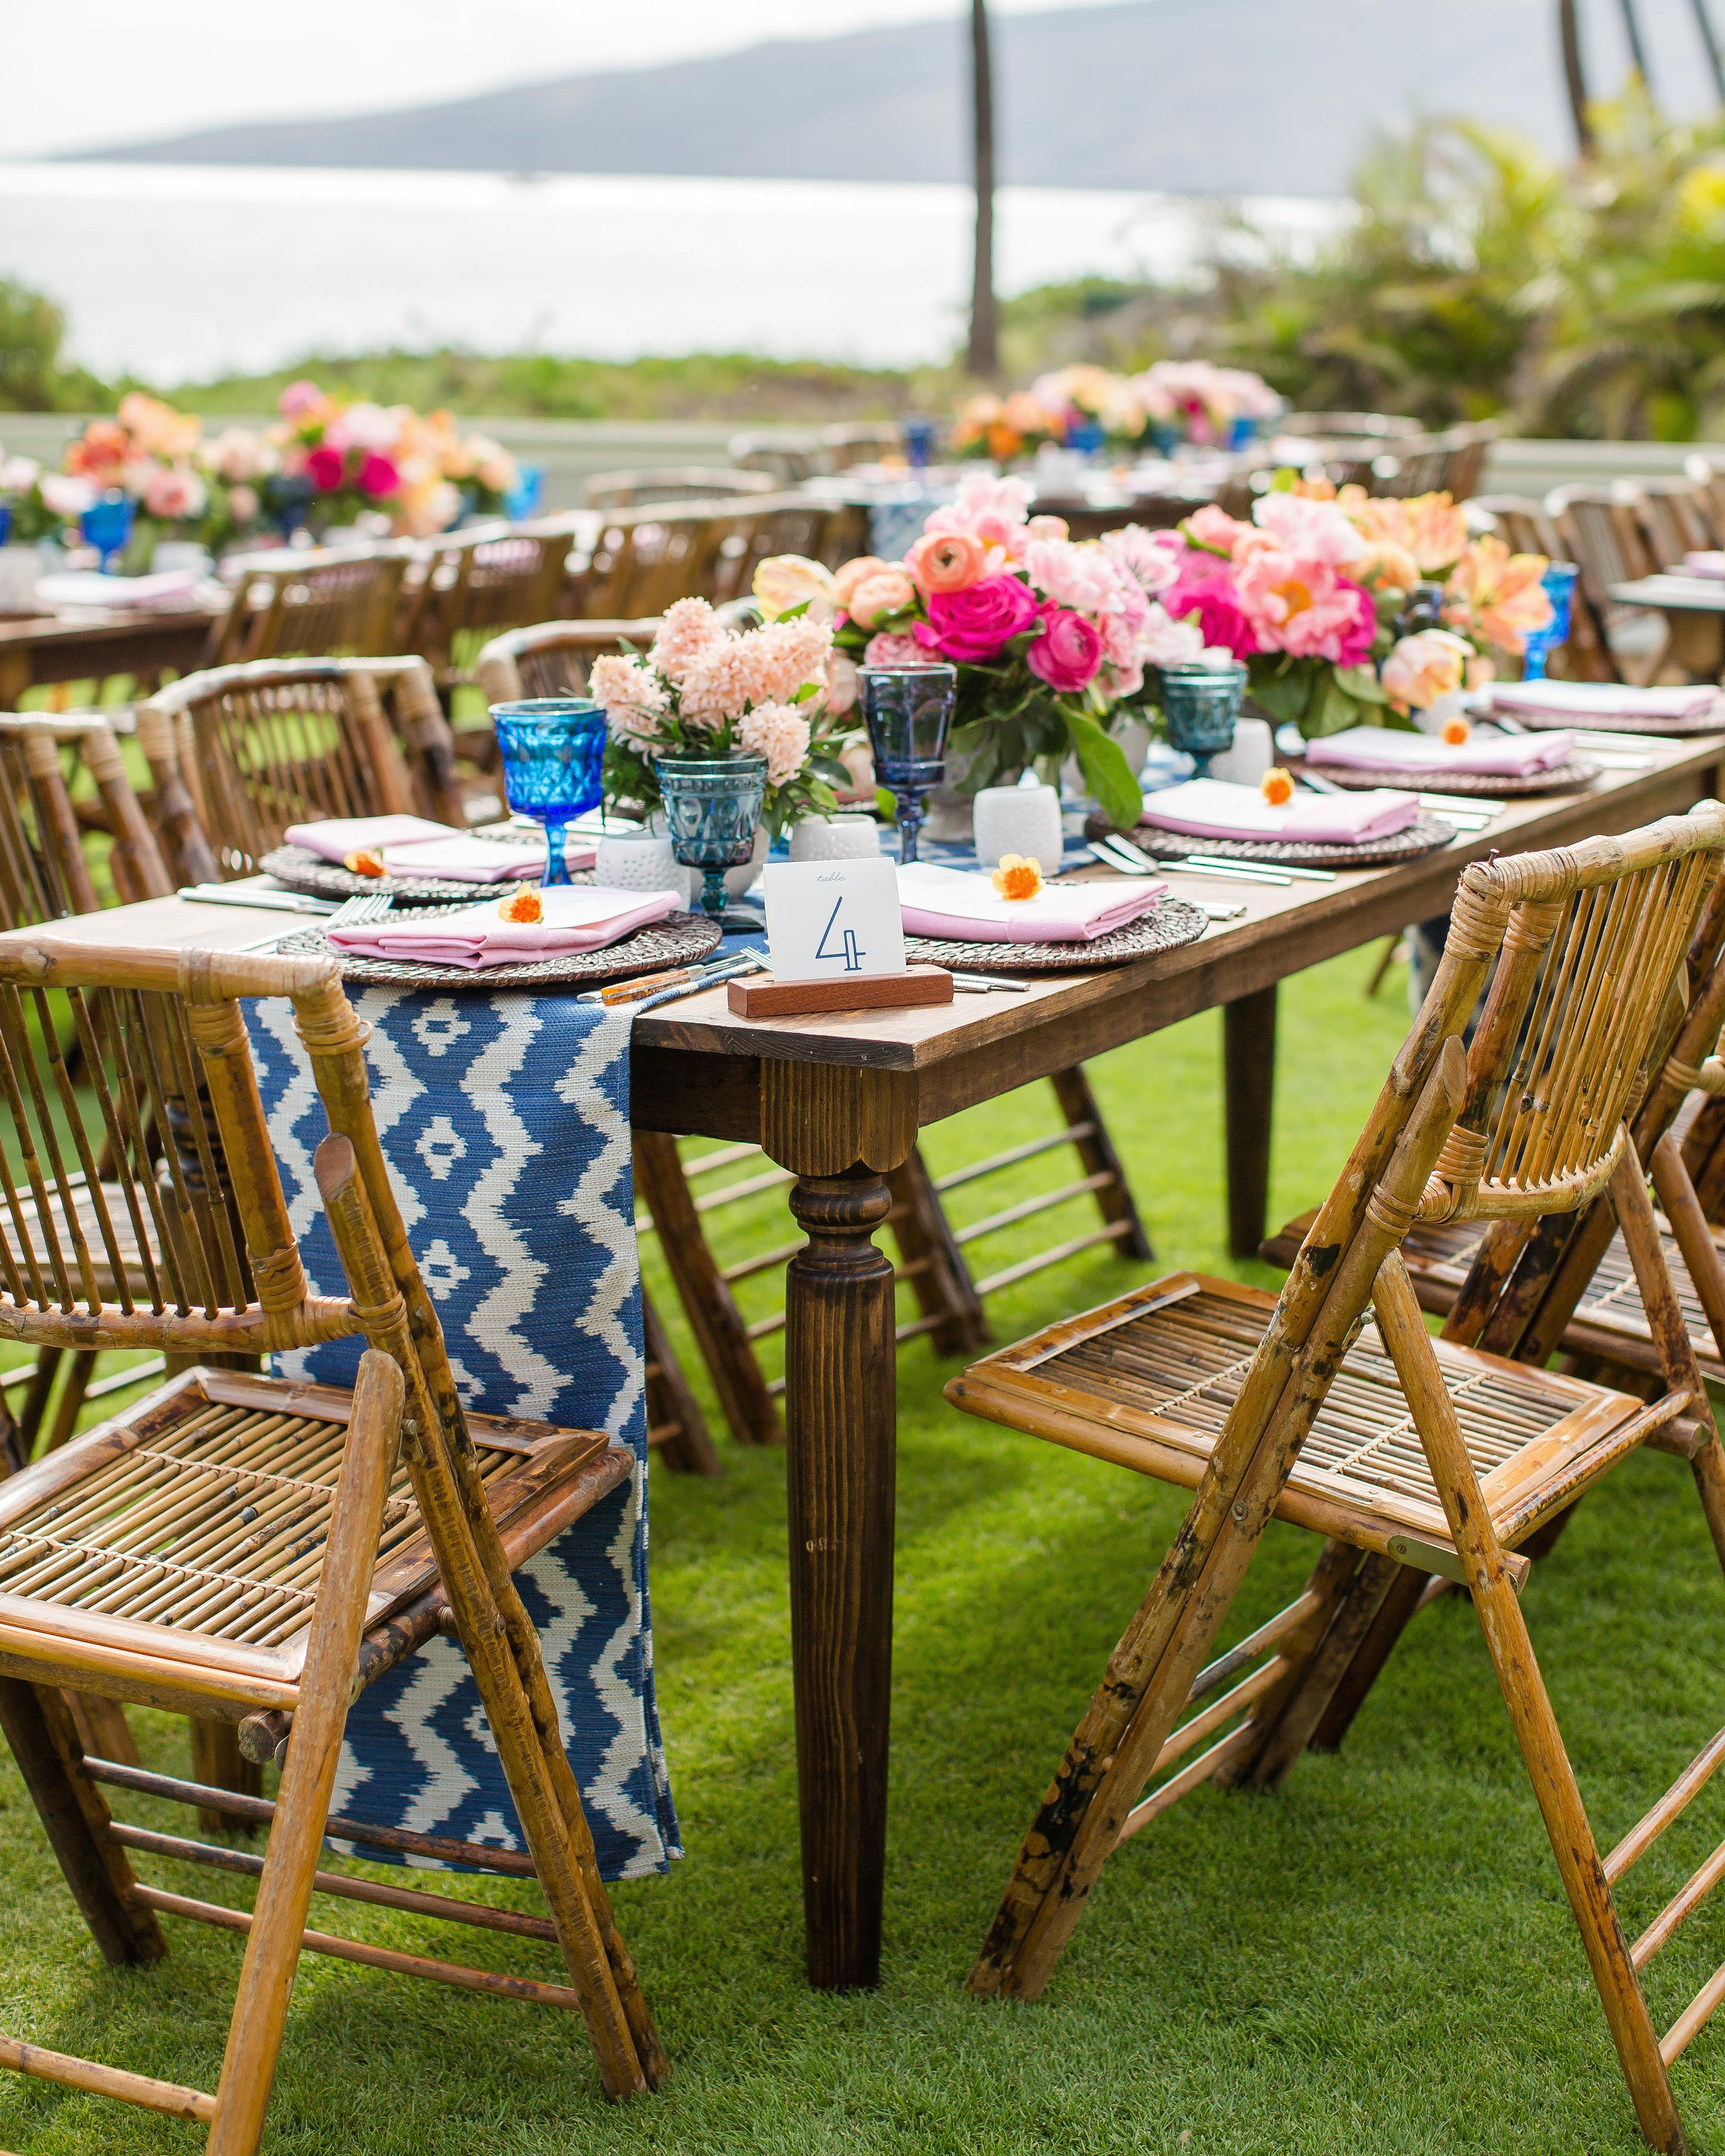 christen-tim-wedding-table-21556-6143924-0816.jpg